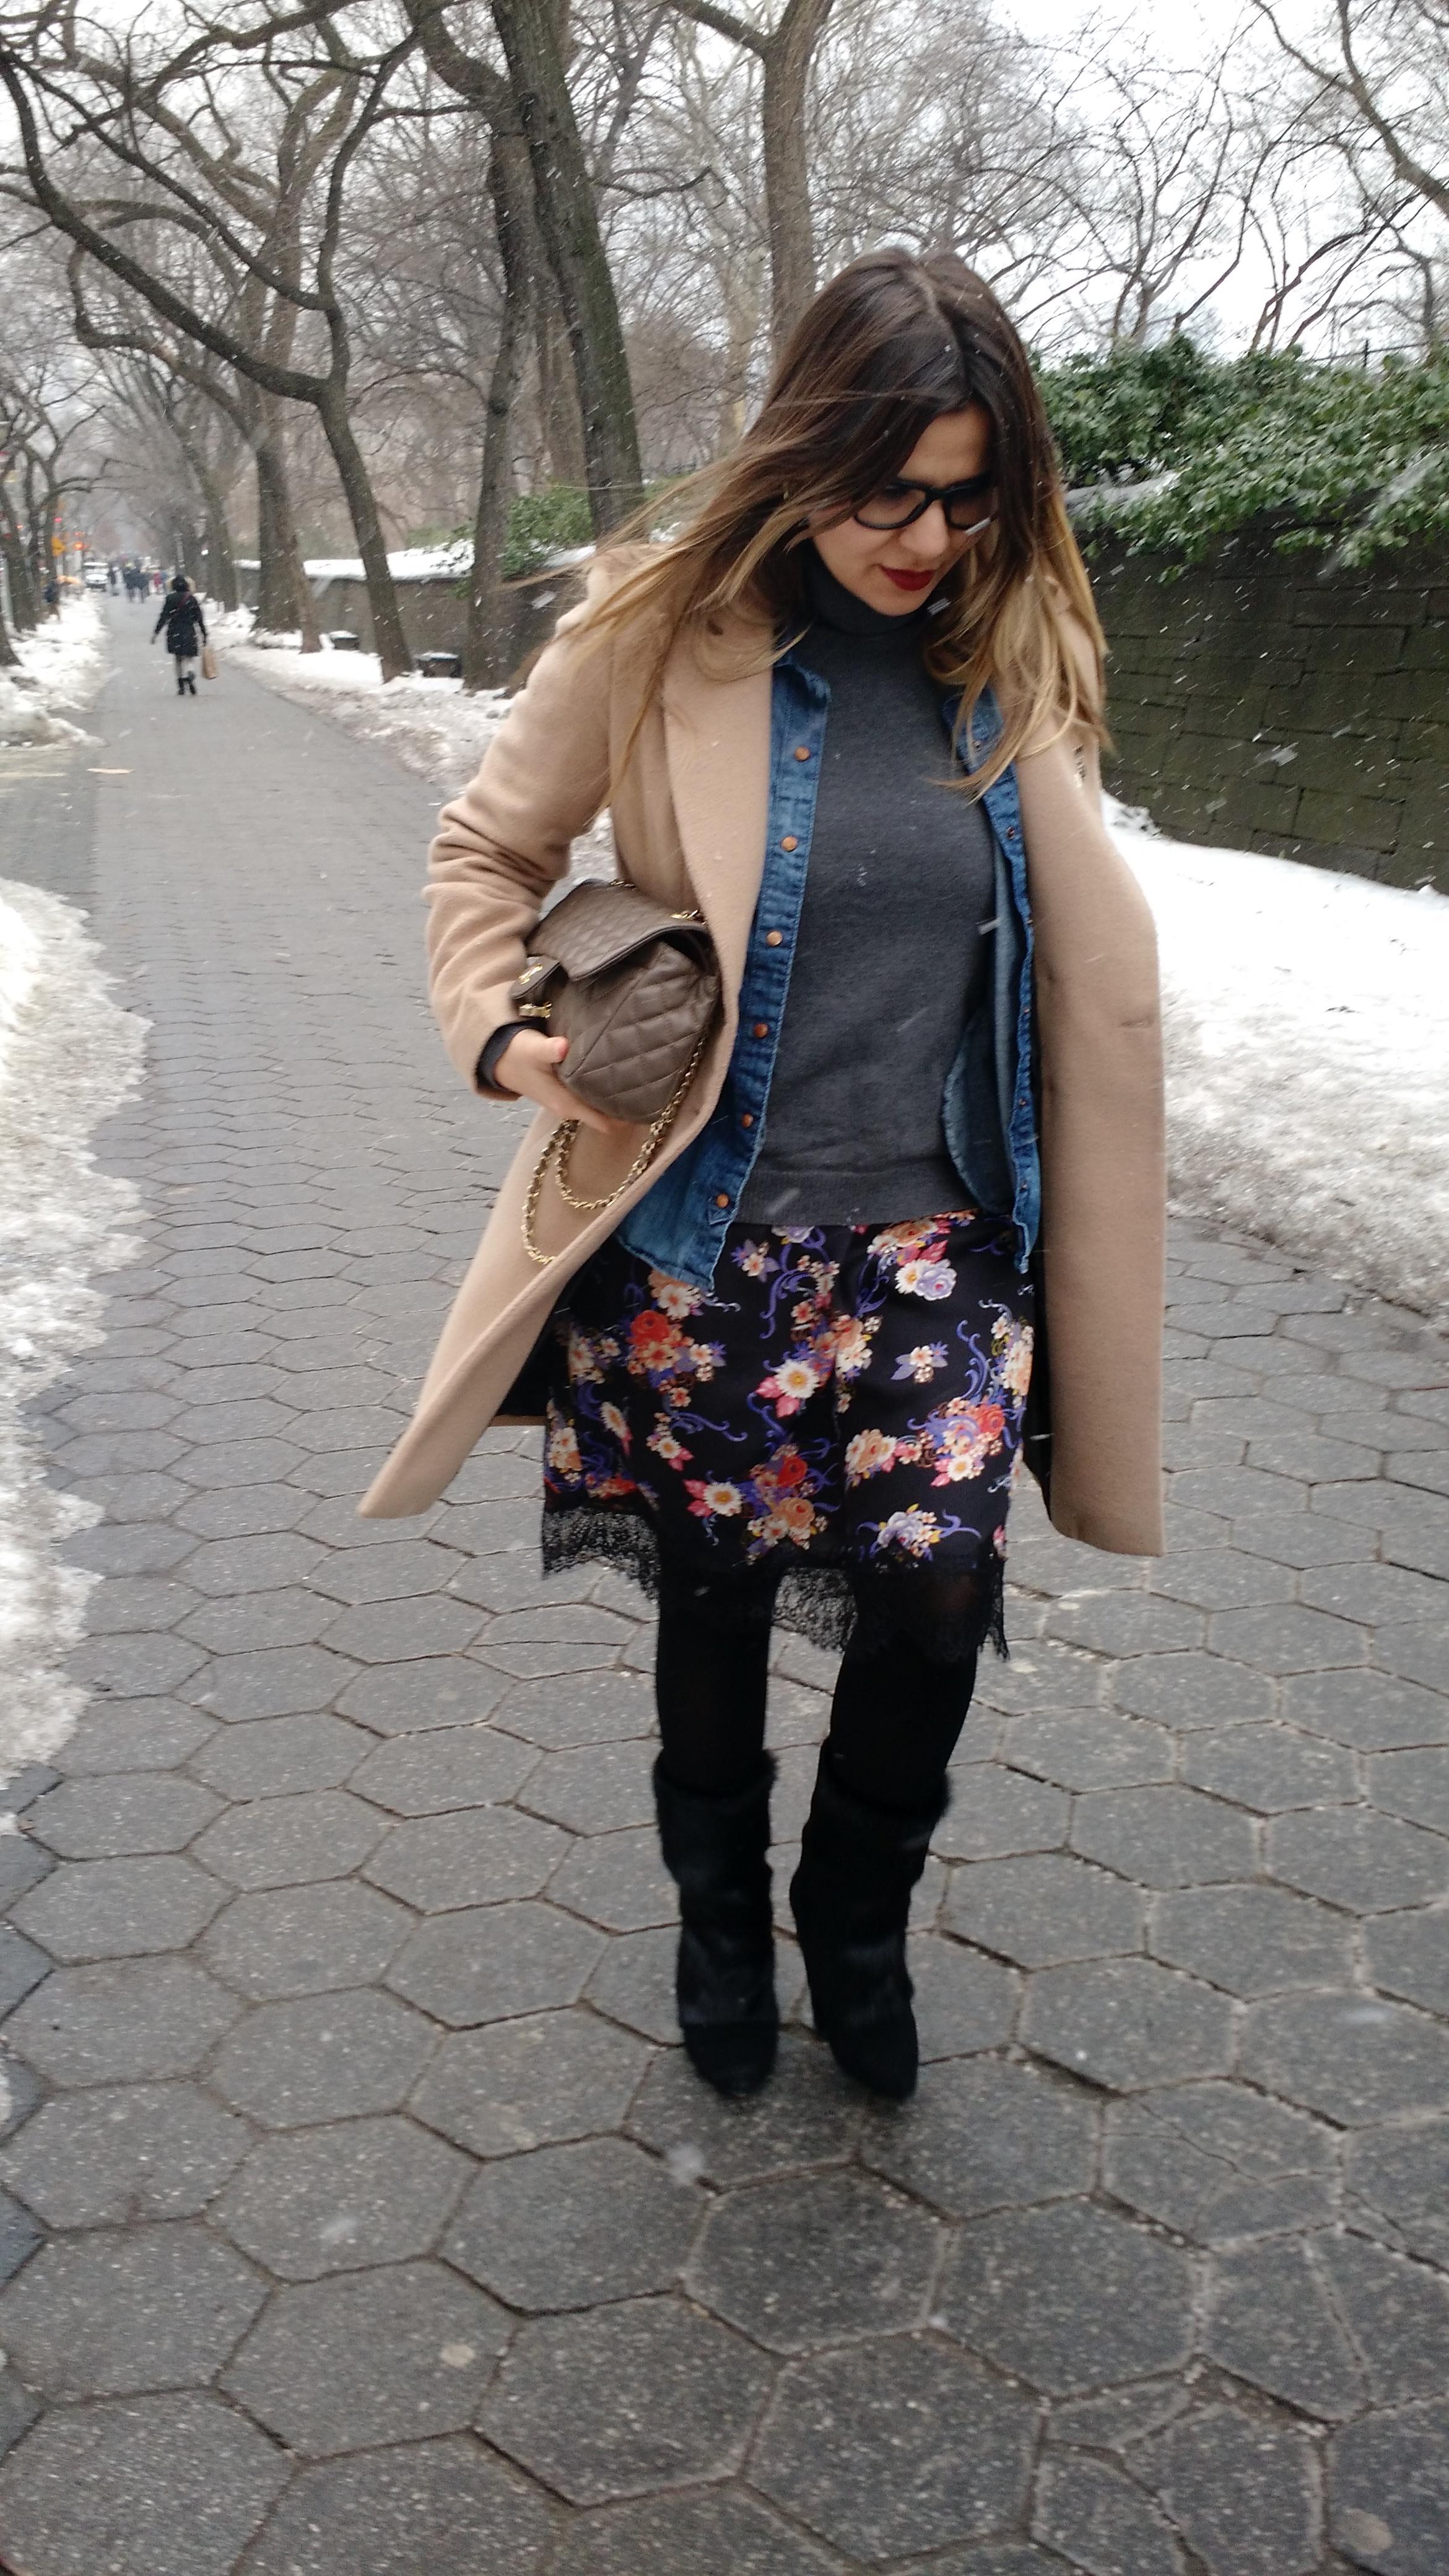 new_york_fashion_week_2015_street_style_alley_girl_fashion_style_blog3